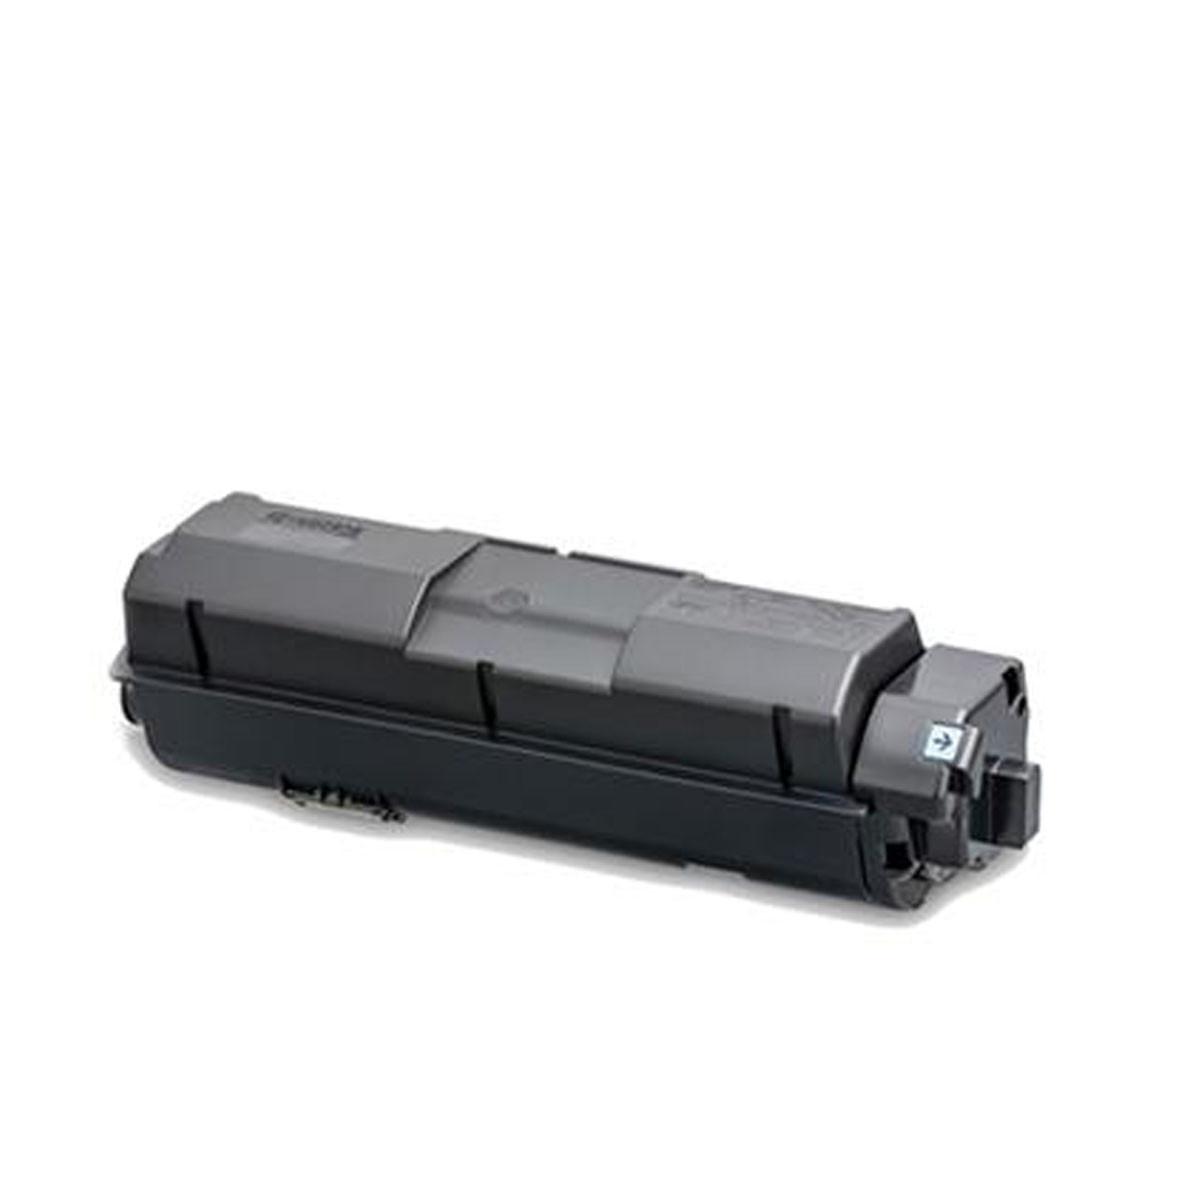 Toner Compatível Kyocera TK1175 TK-1175   M2040 M2640 2040DN 2640IDW   Katun Performance 12k